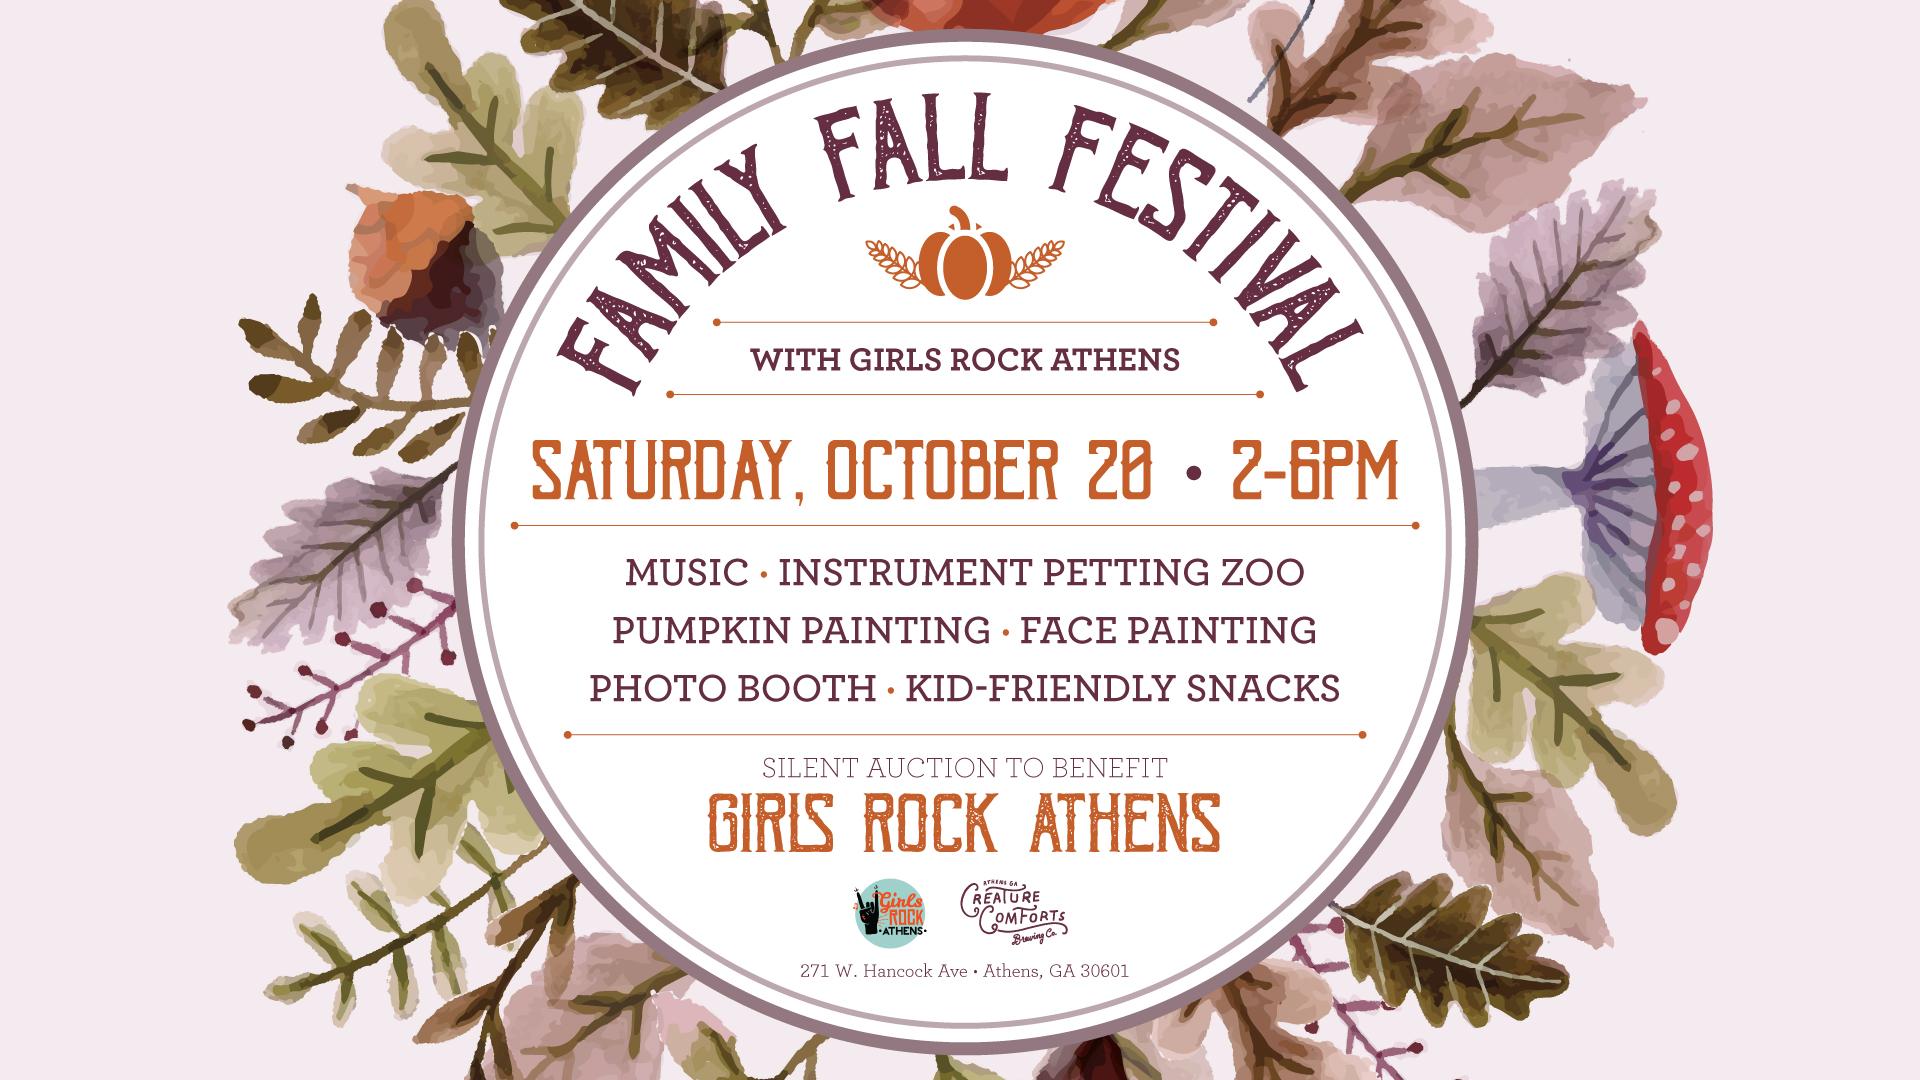 CCBC_Girls_Rock_Fall_Festival_Social_Media_Graphic_FB.jpg